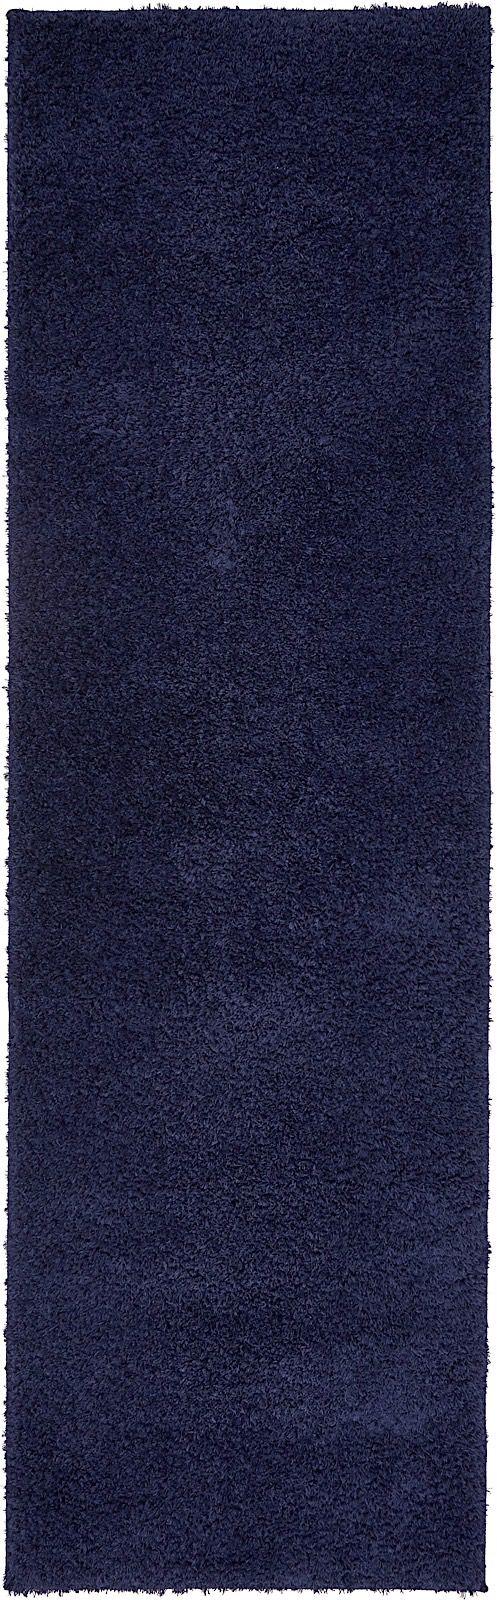 paramount shag area rug collection